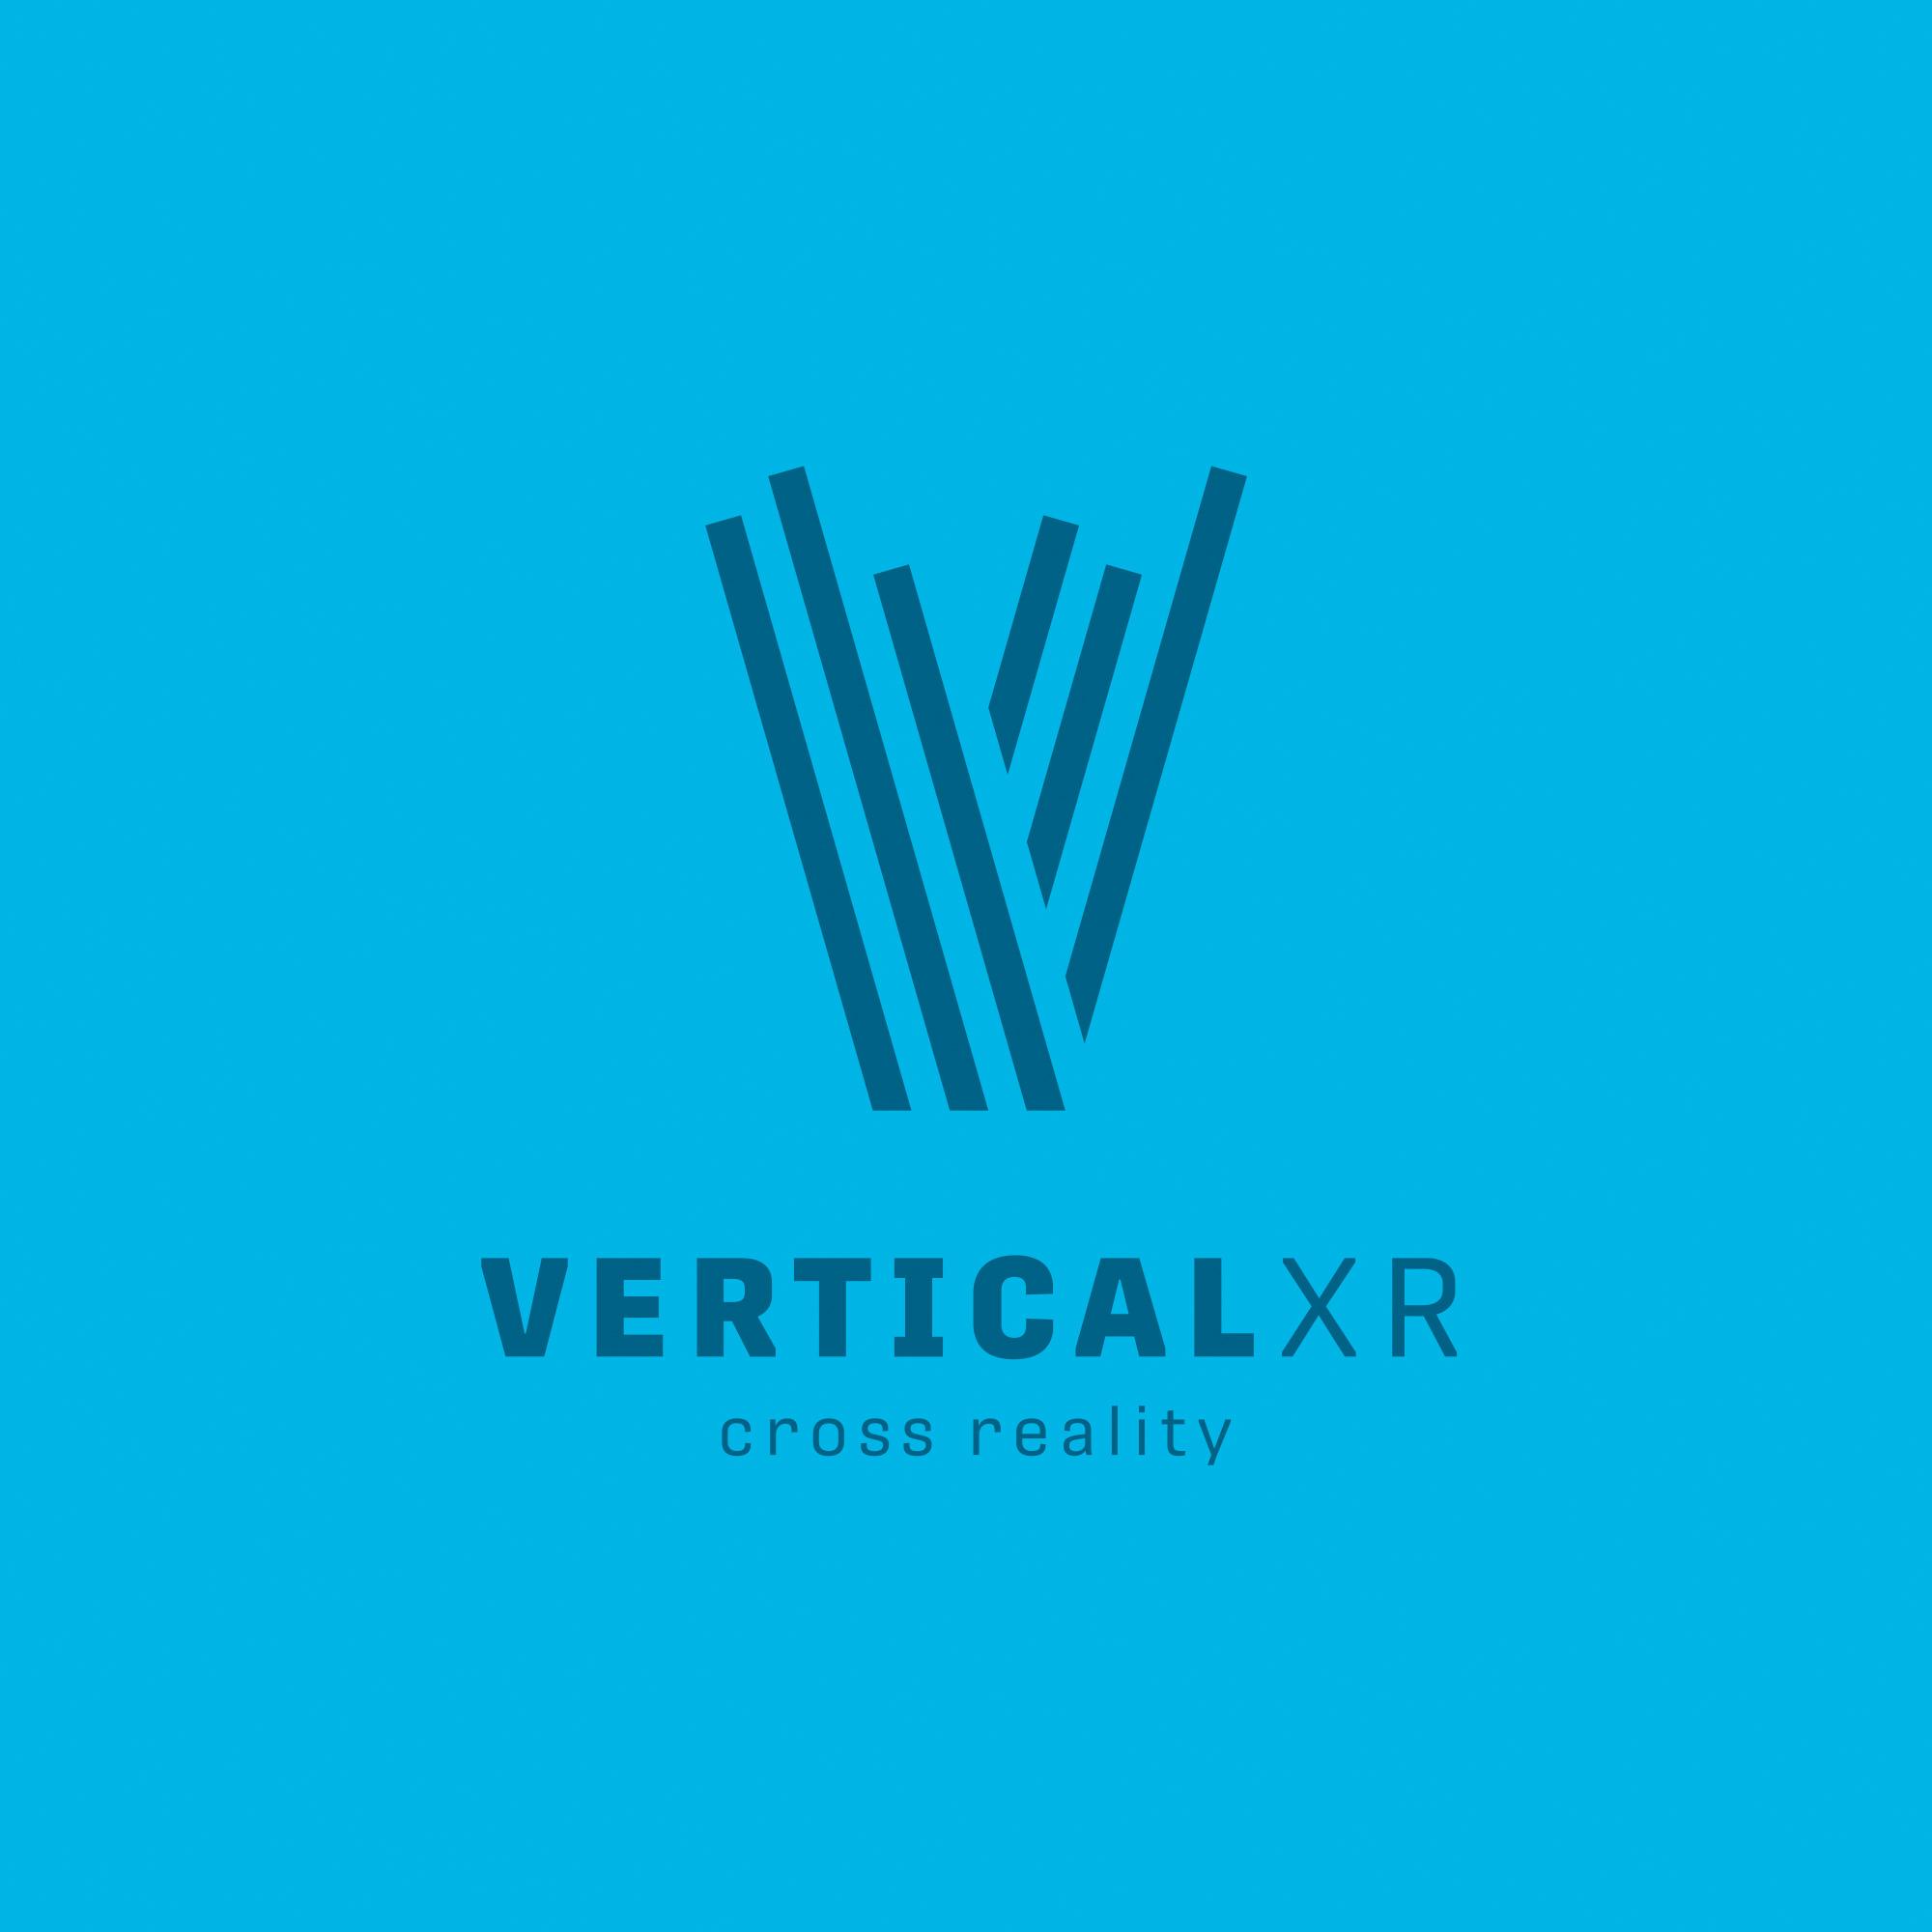 [album/Products_Model_Product/119/Vertical_XR_logo_4c_pos_C.jpg]